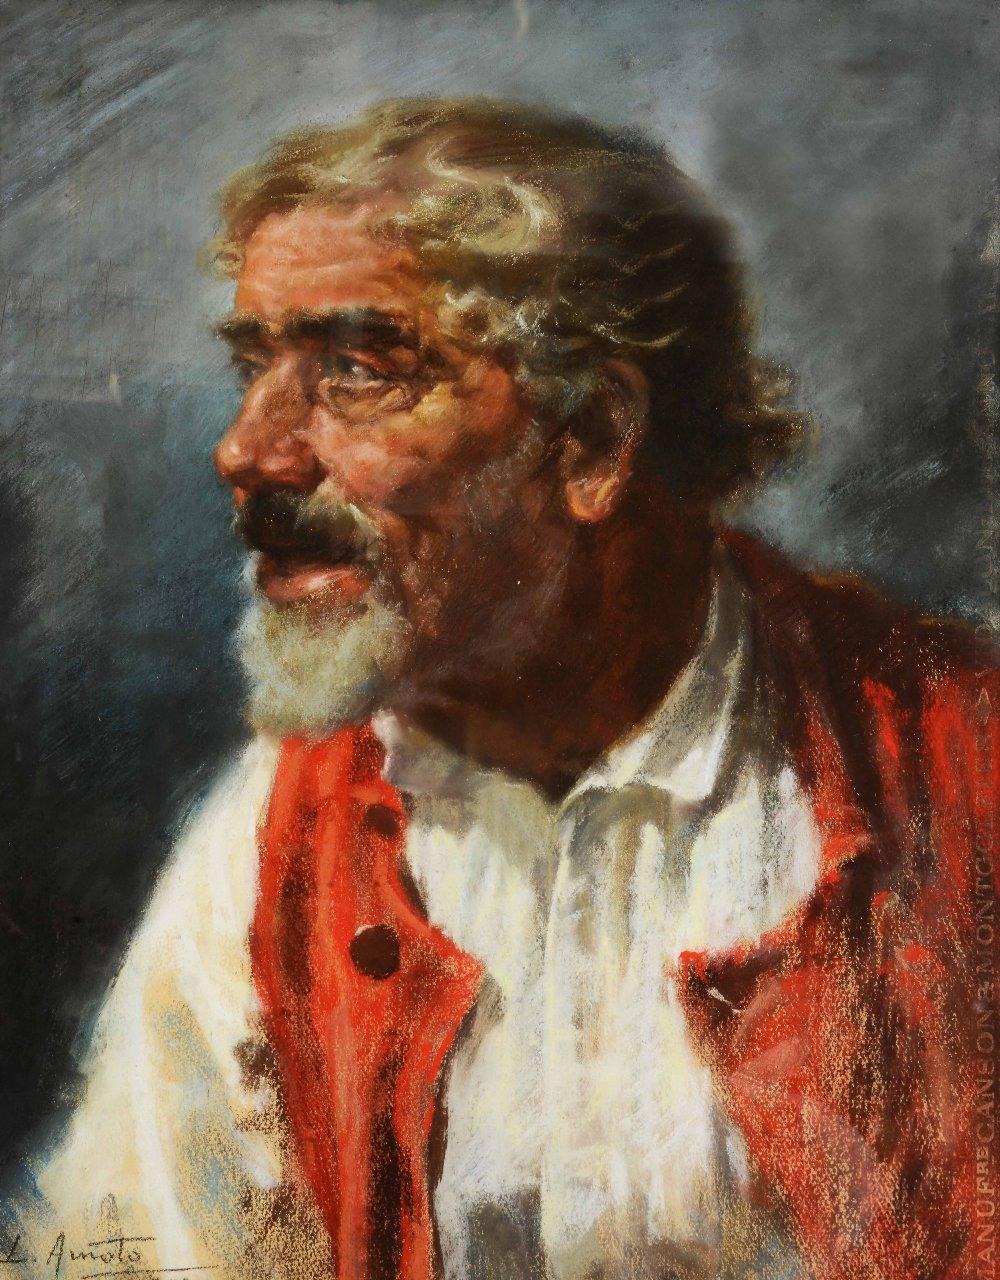 Lot 259 - LUIGI AMATO (1898-1961) Portrait of a gentleman wearing cream shirt and buttoned red waistcoat,